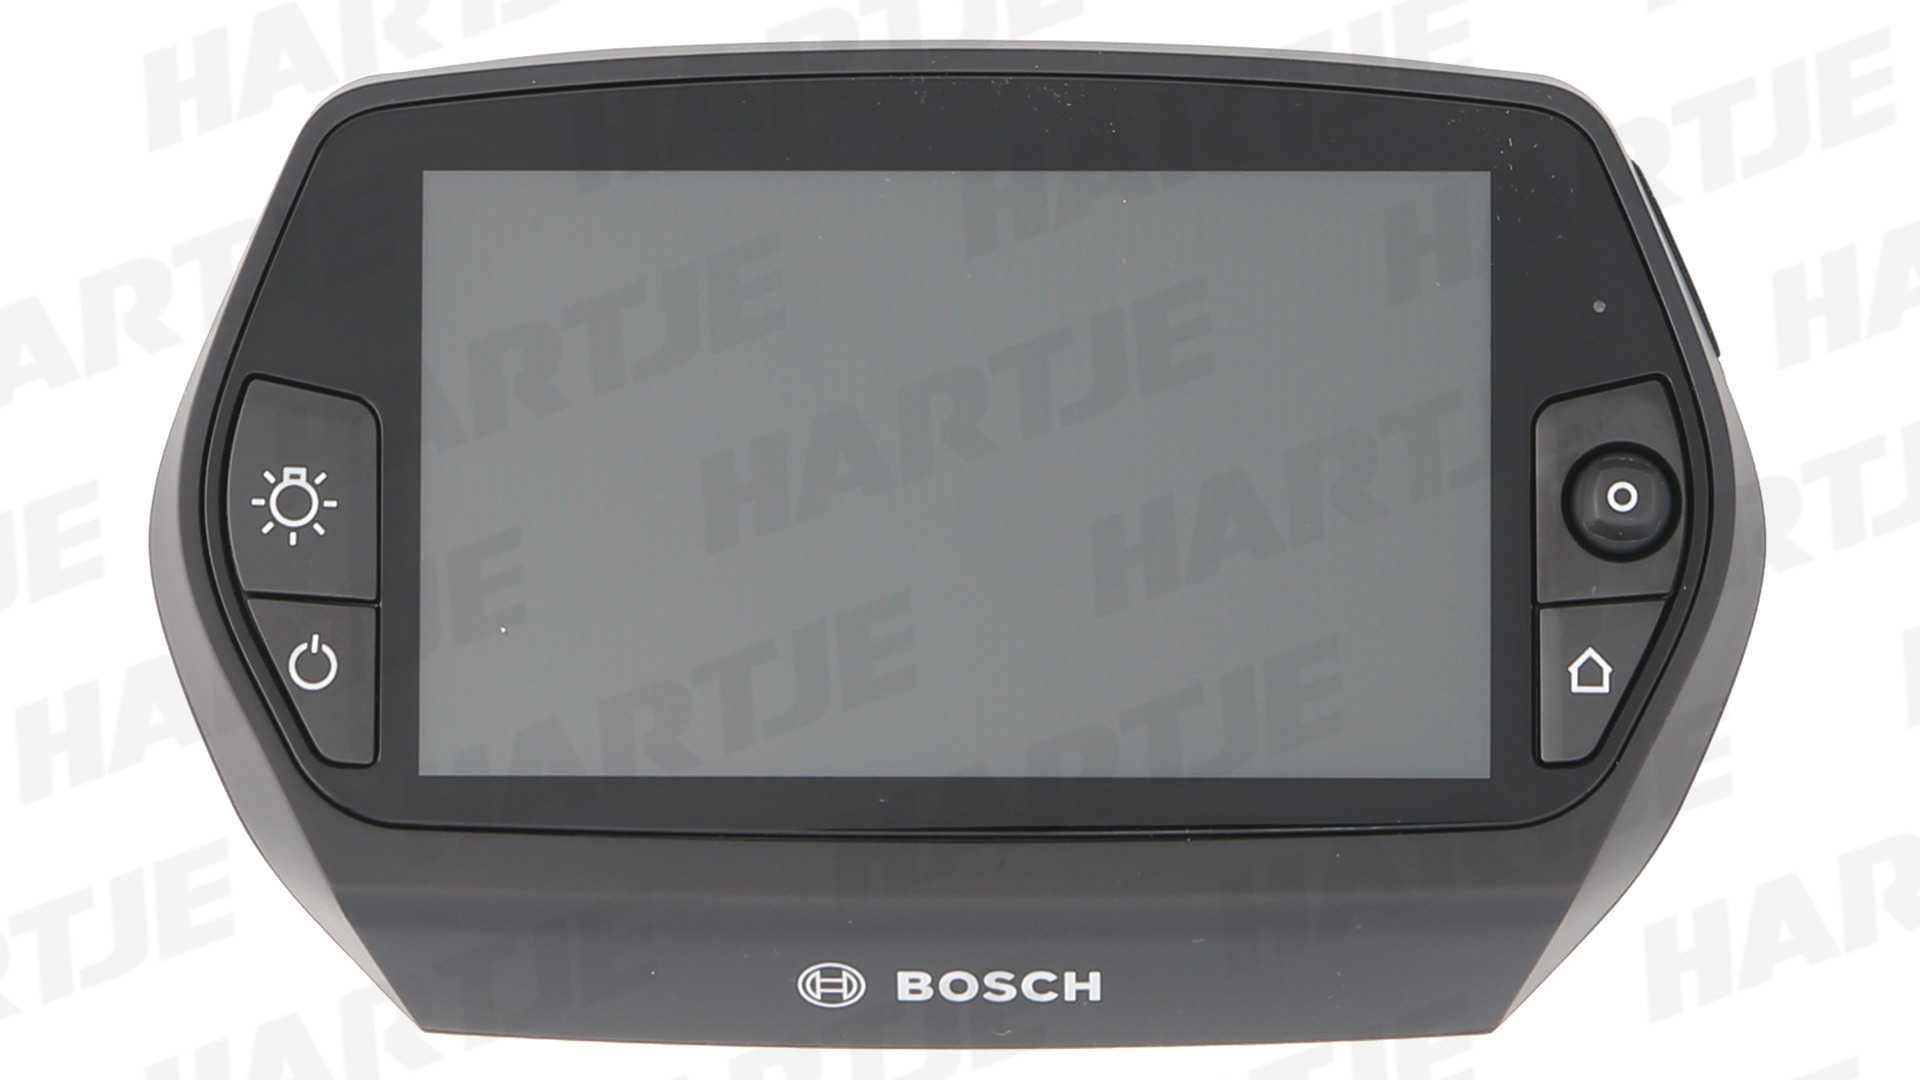 850e7bc264b Bosch Boordcomputer nyon zonder houder en bedieningsunit - 1270020915